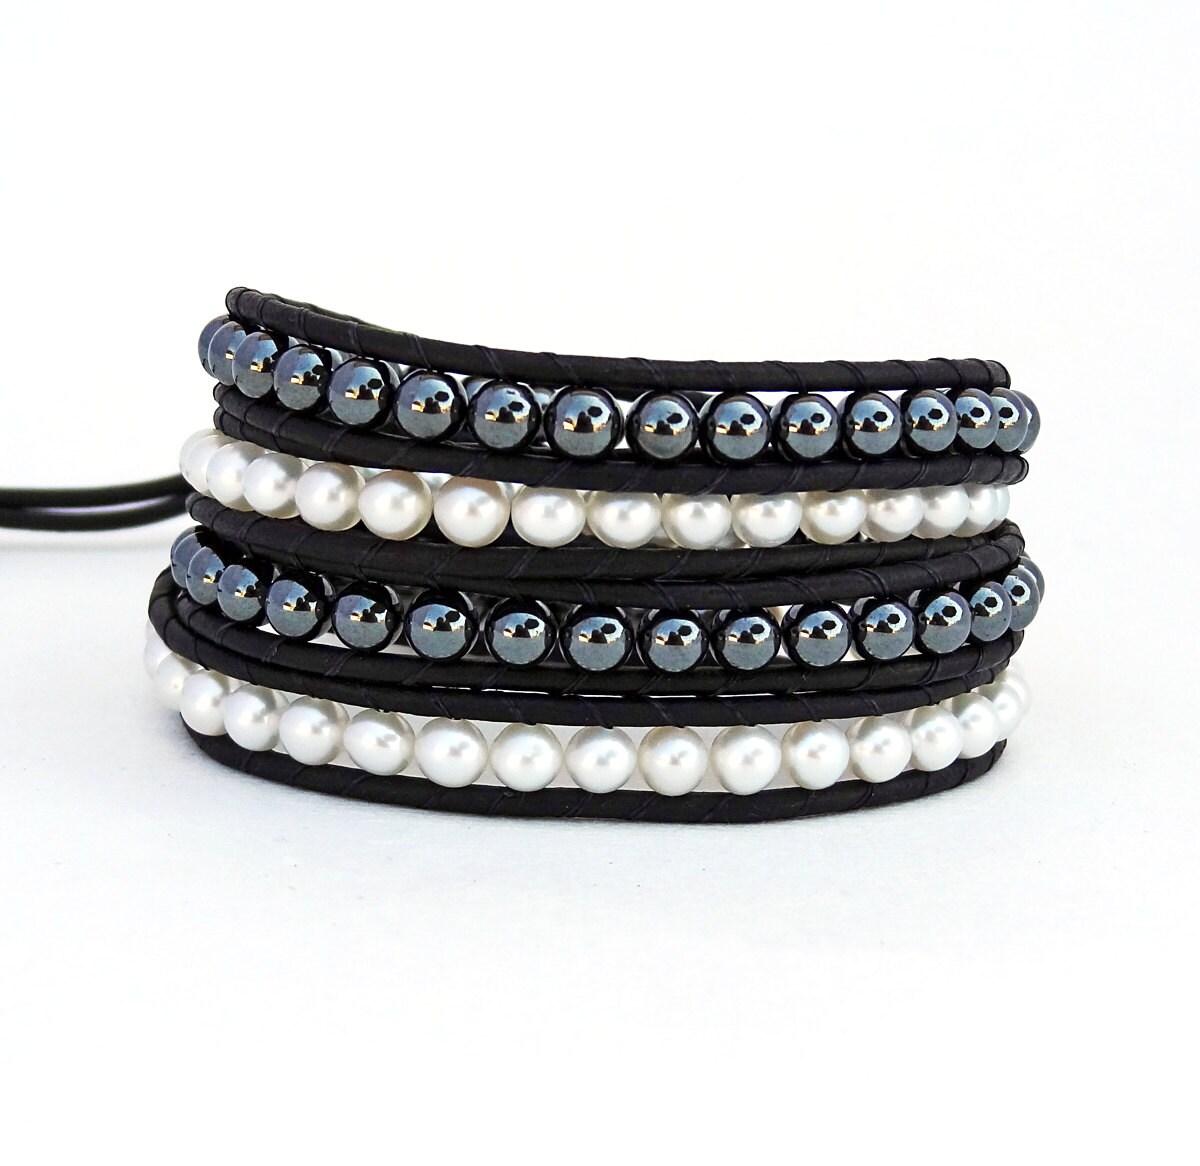 pearl wrap bracelet leather and pearl bracelet black and. Black Bedroom Furniture Sets. Home Design Ideas